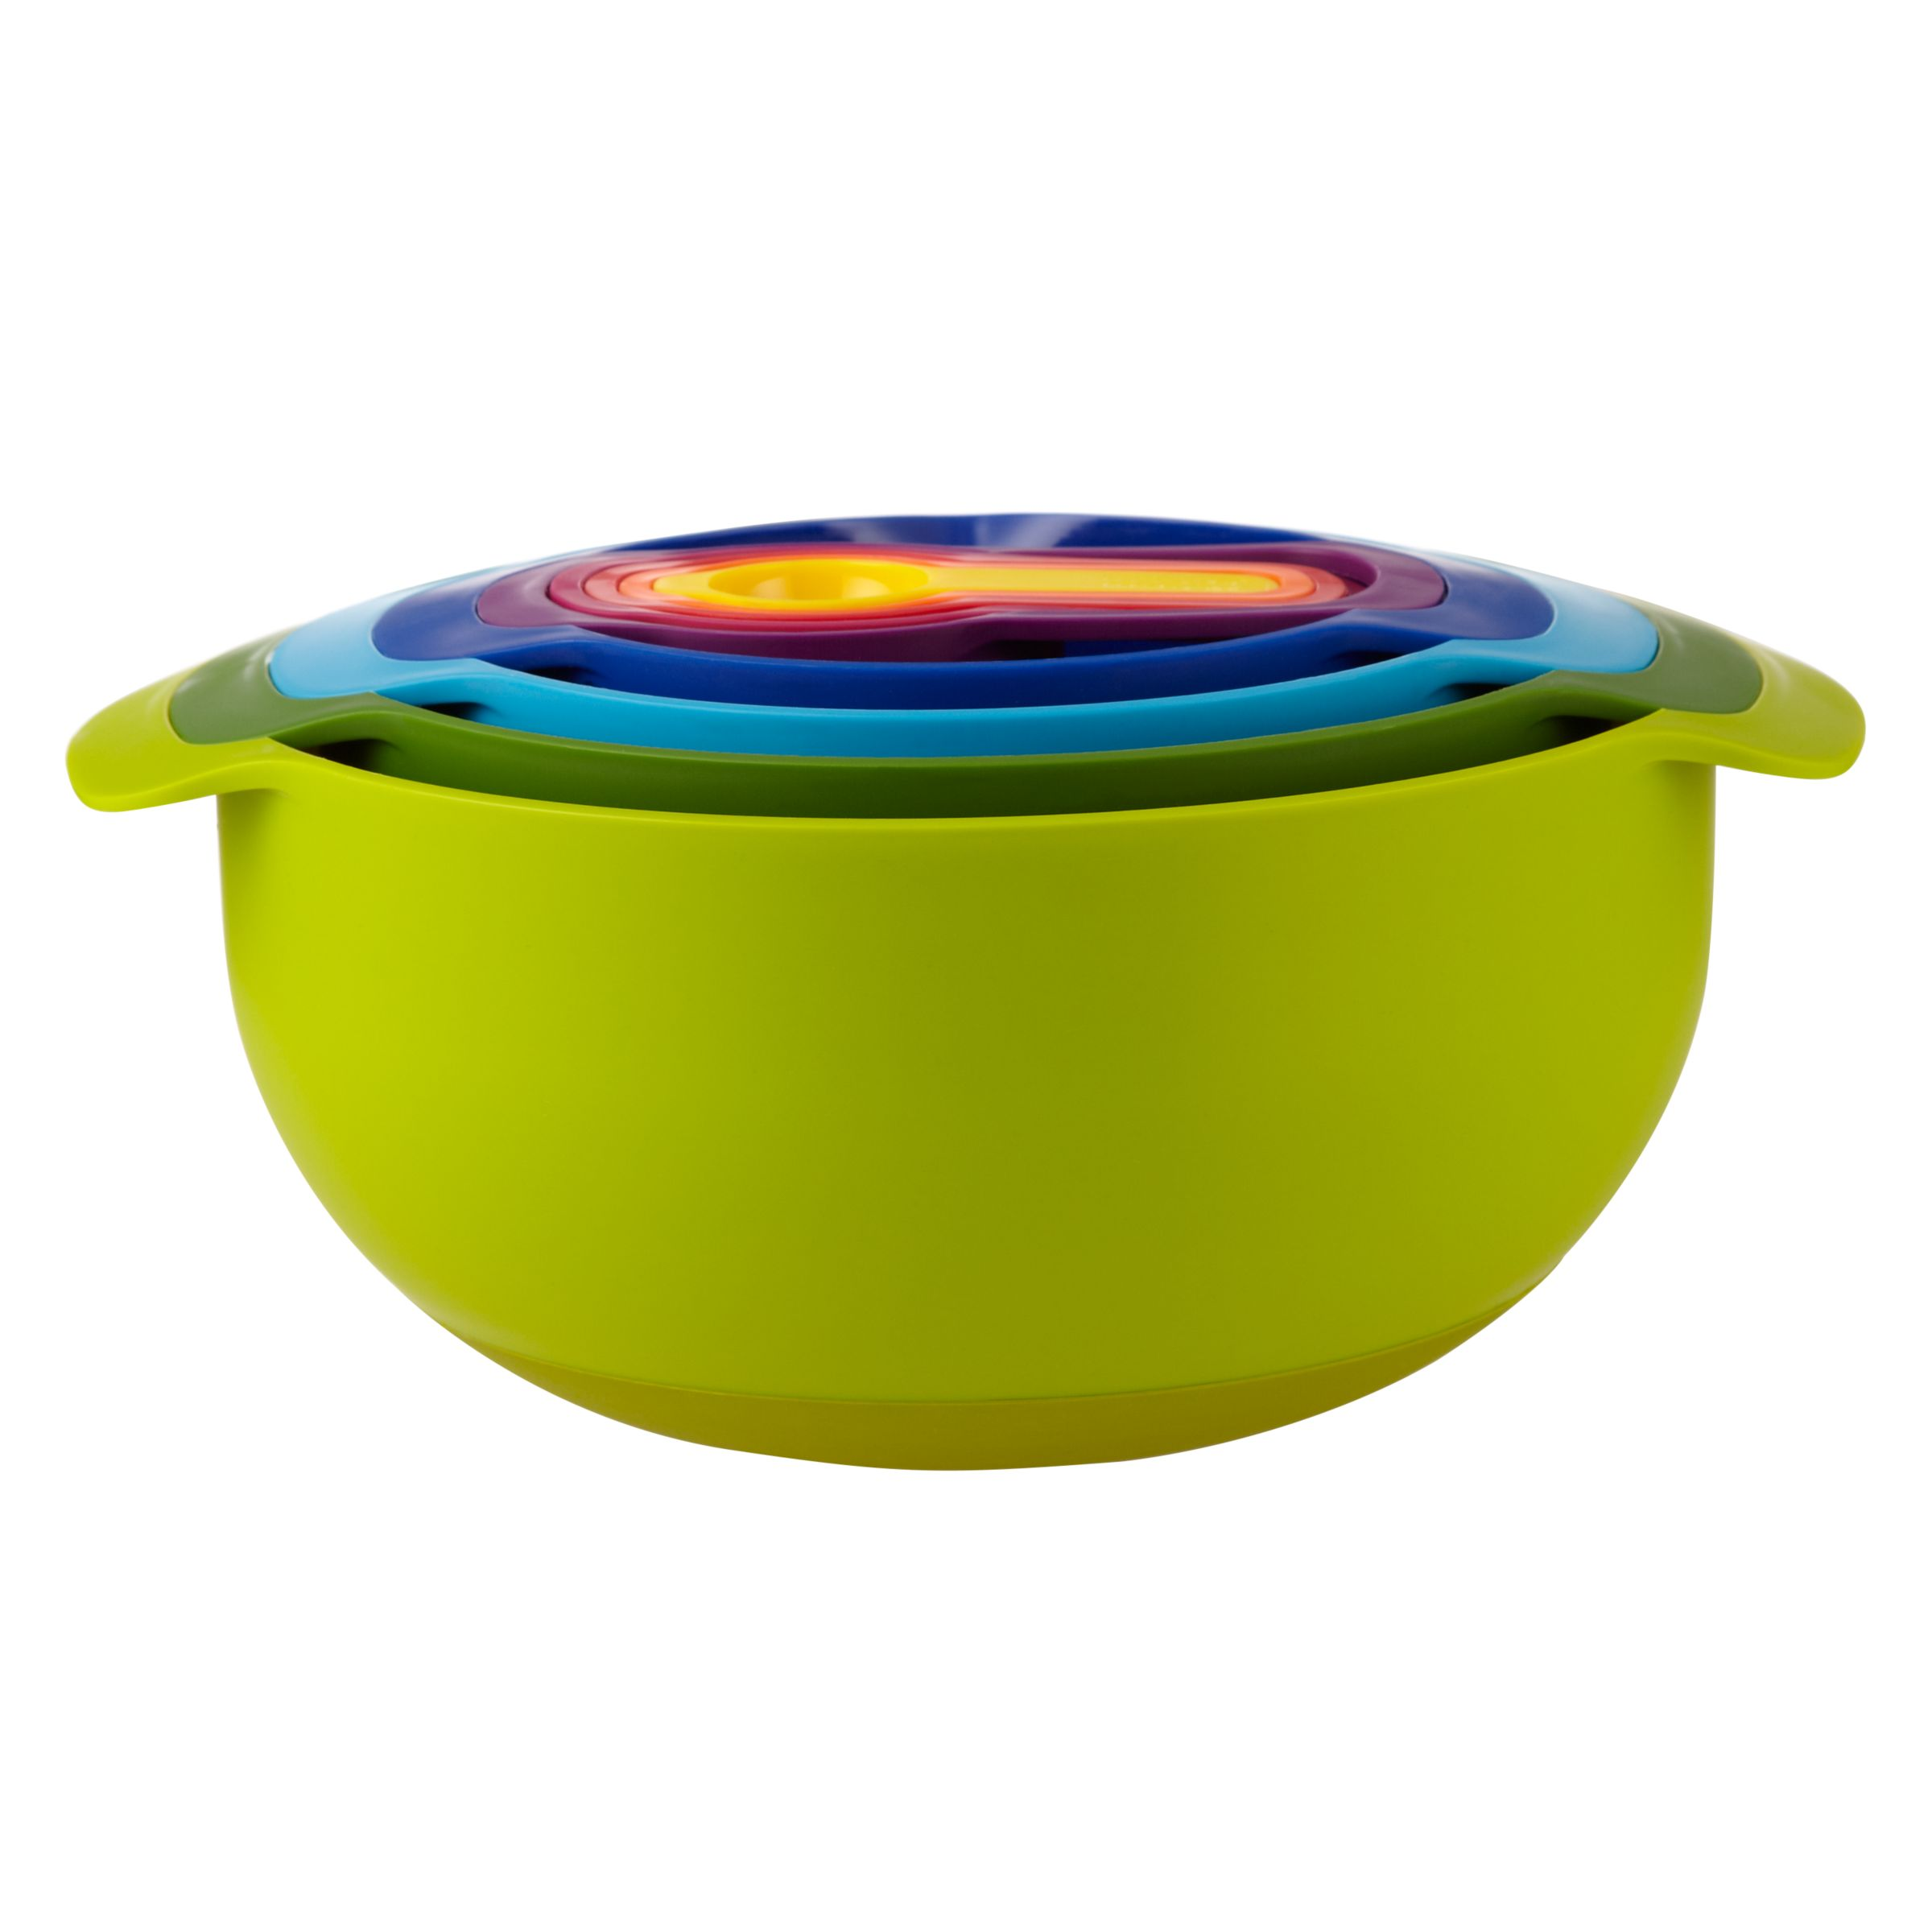 Joseph Joseph Nest Plus 9 Mixing Bowls and Measuring Cups Set, Multi